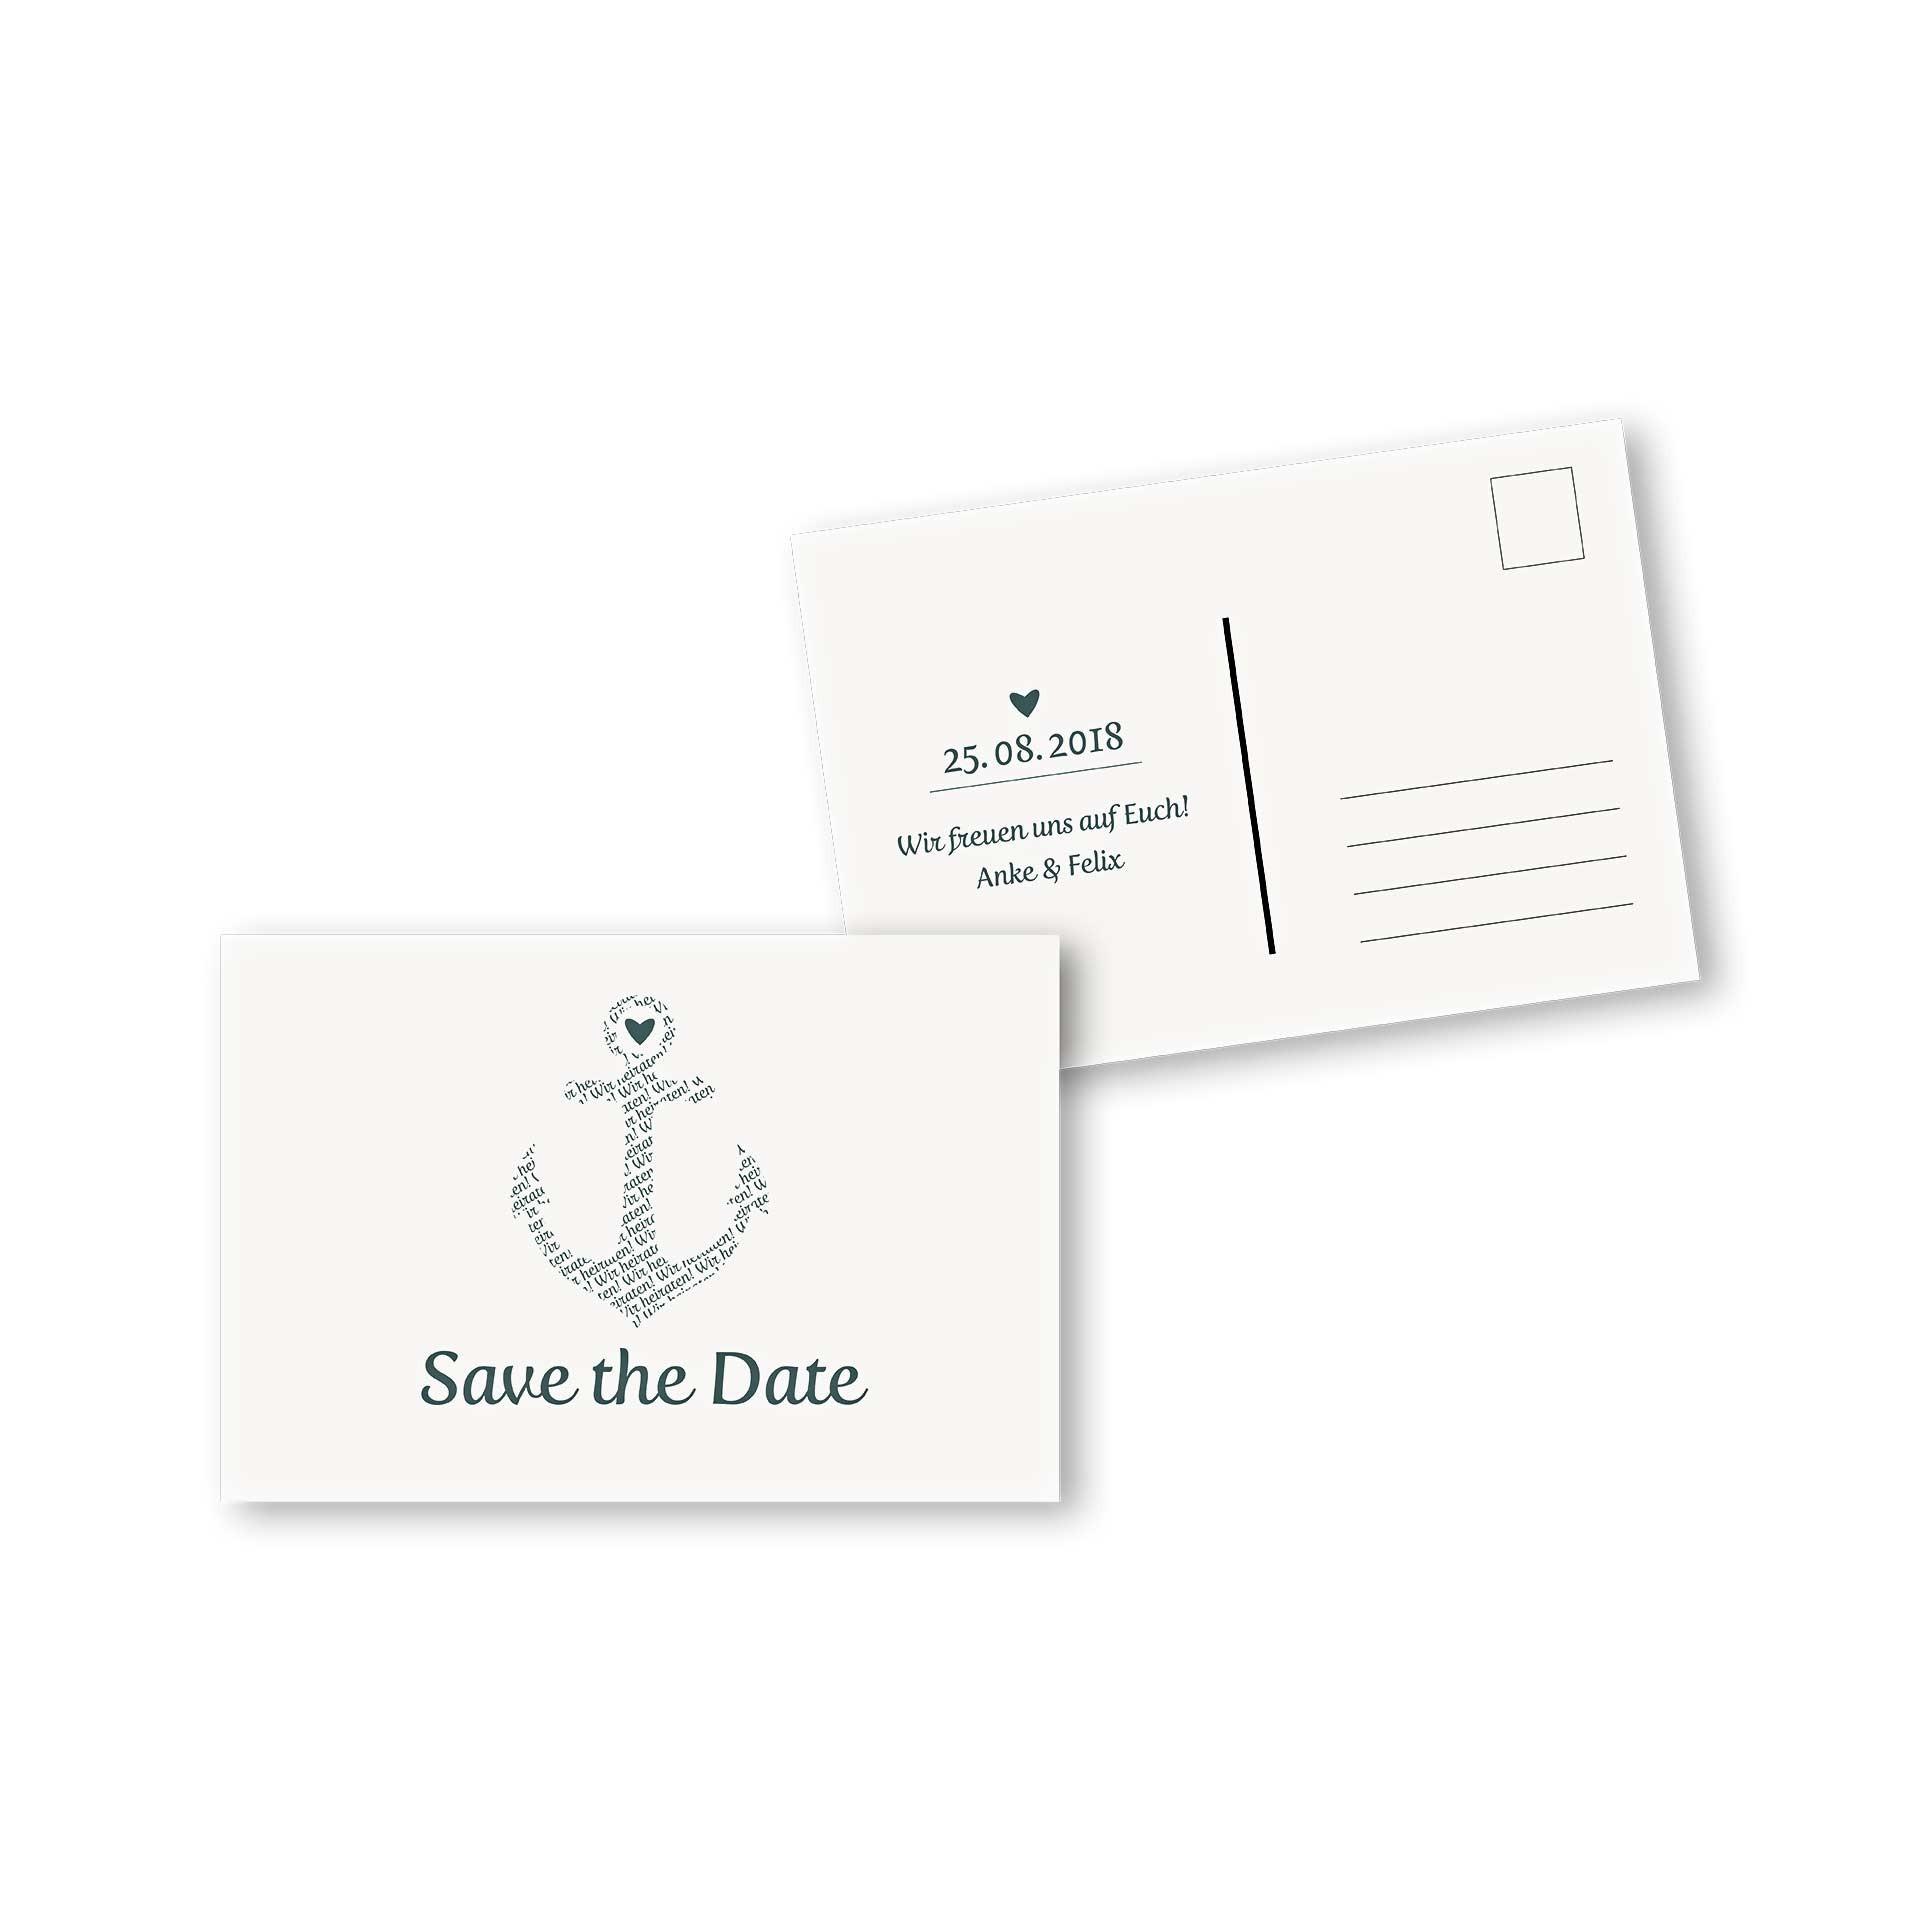 Save the Date Postkarte DIN A6 im Design Anker kombiniert mit